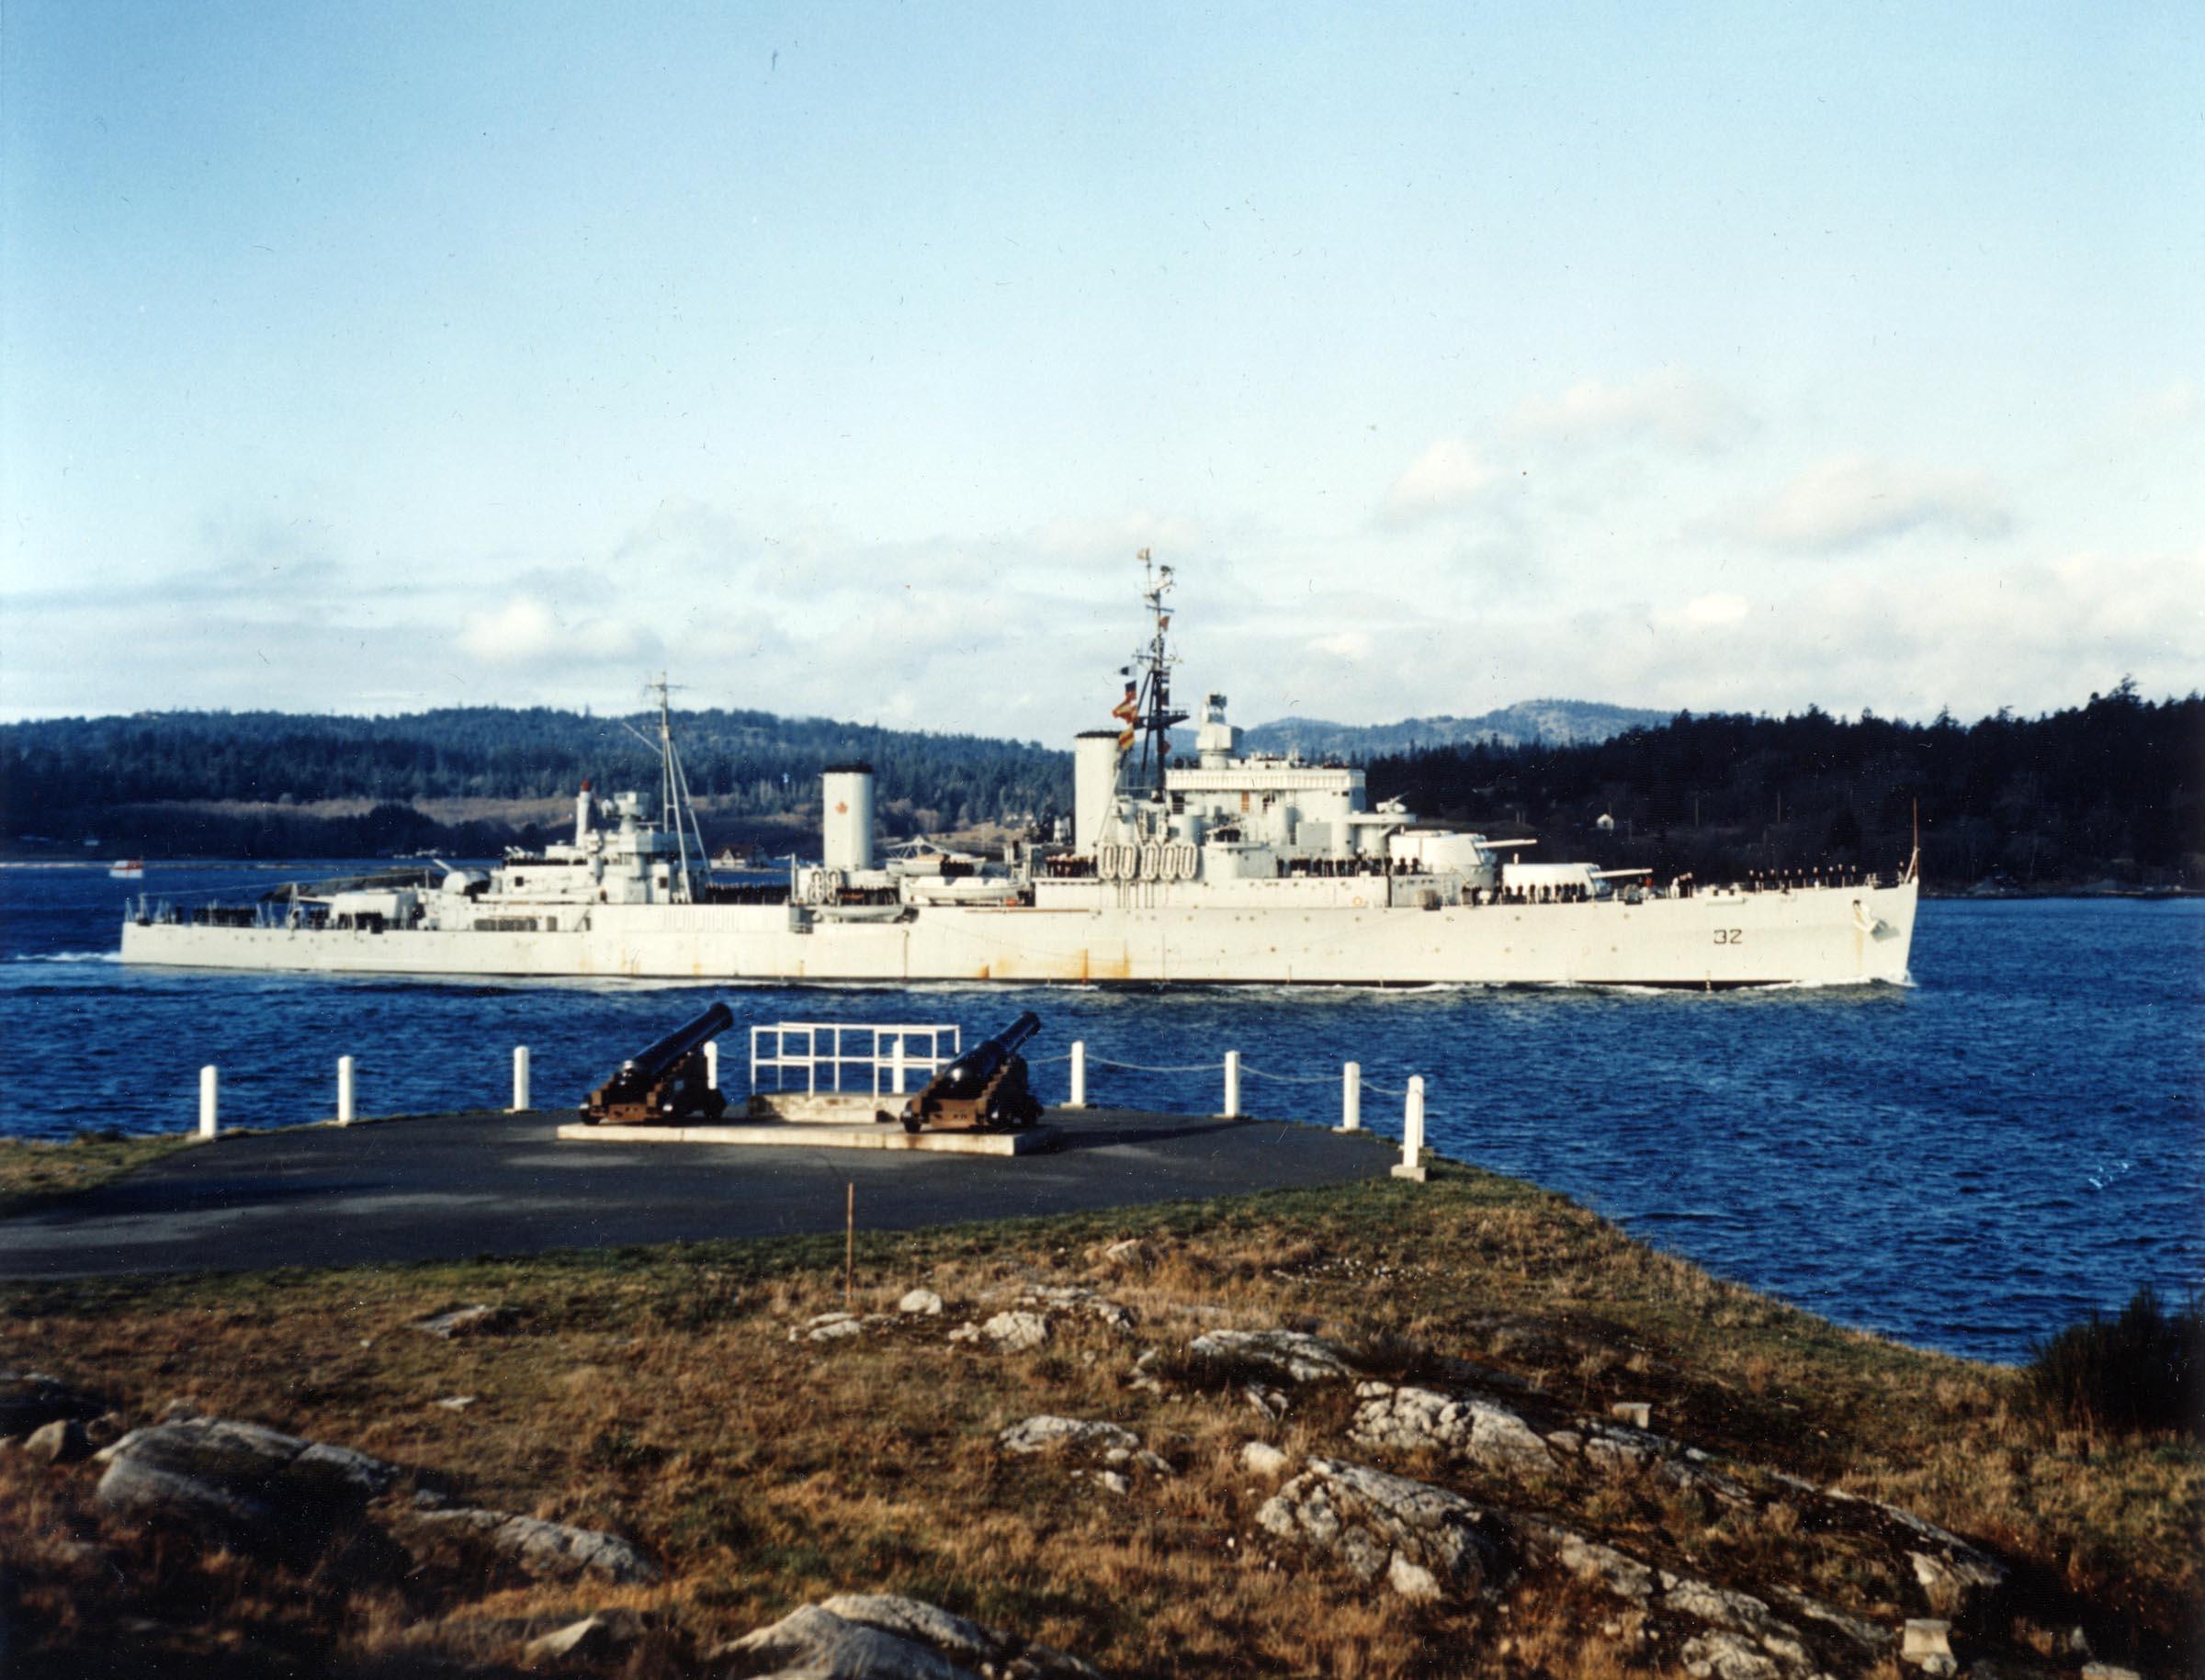 HMCS ONTARIO